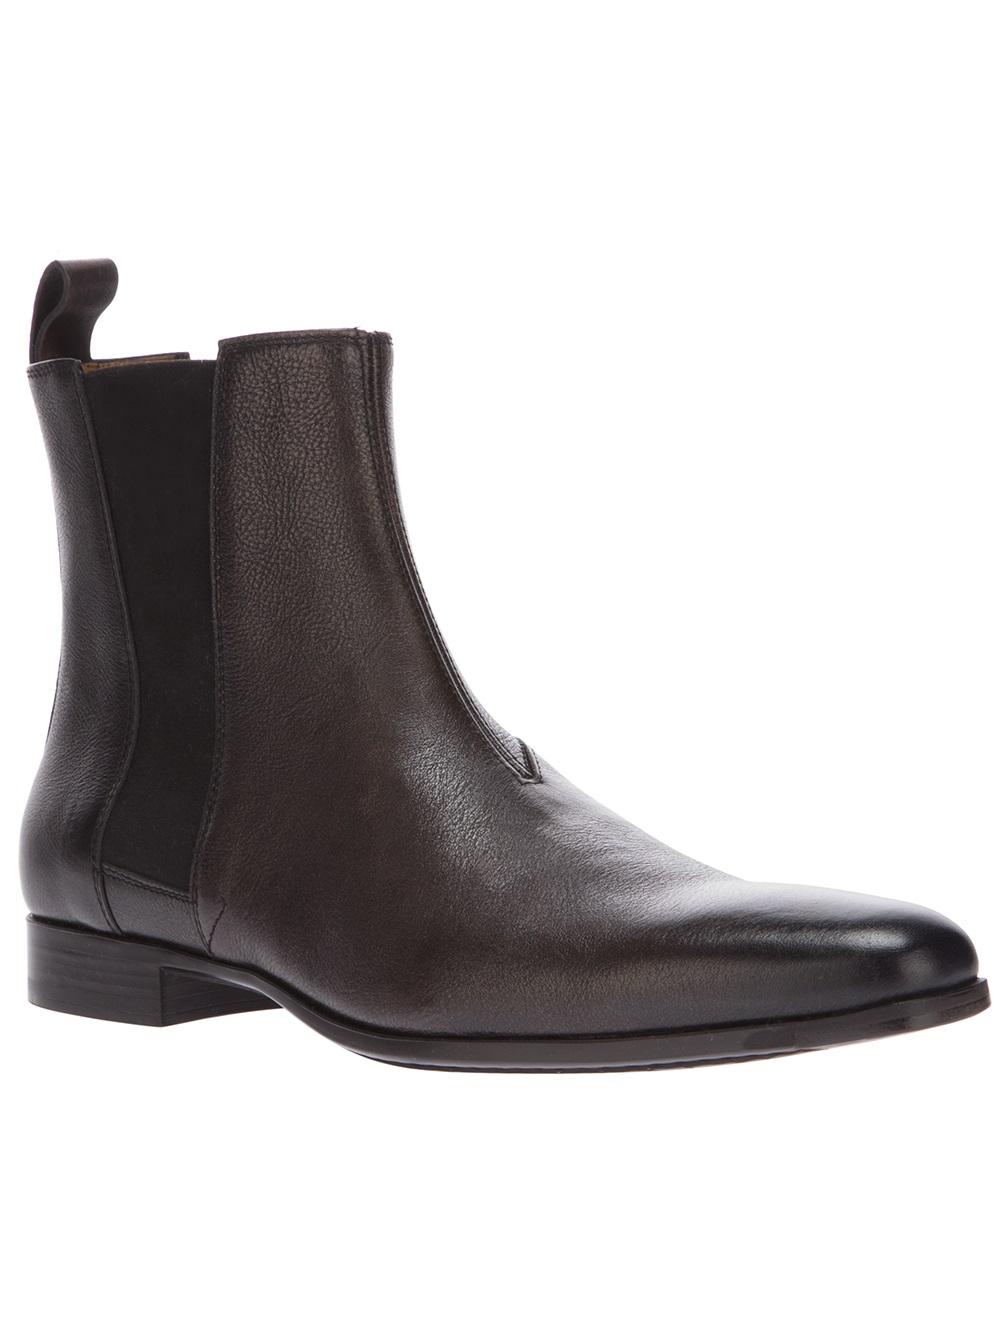 Santoni Chelsea Boot In Black For Men Brown Lyst